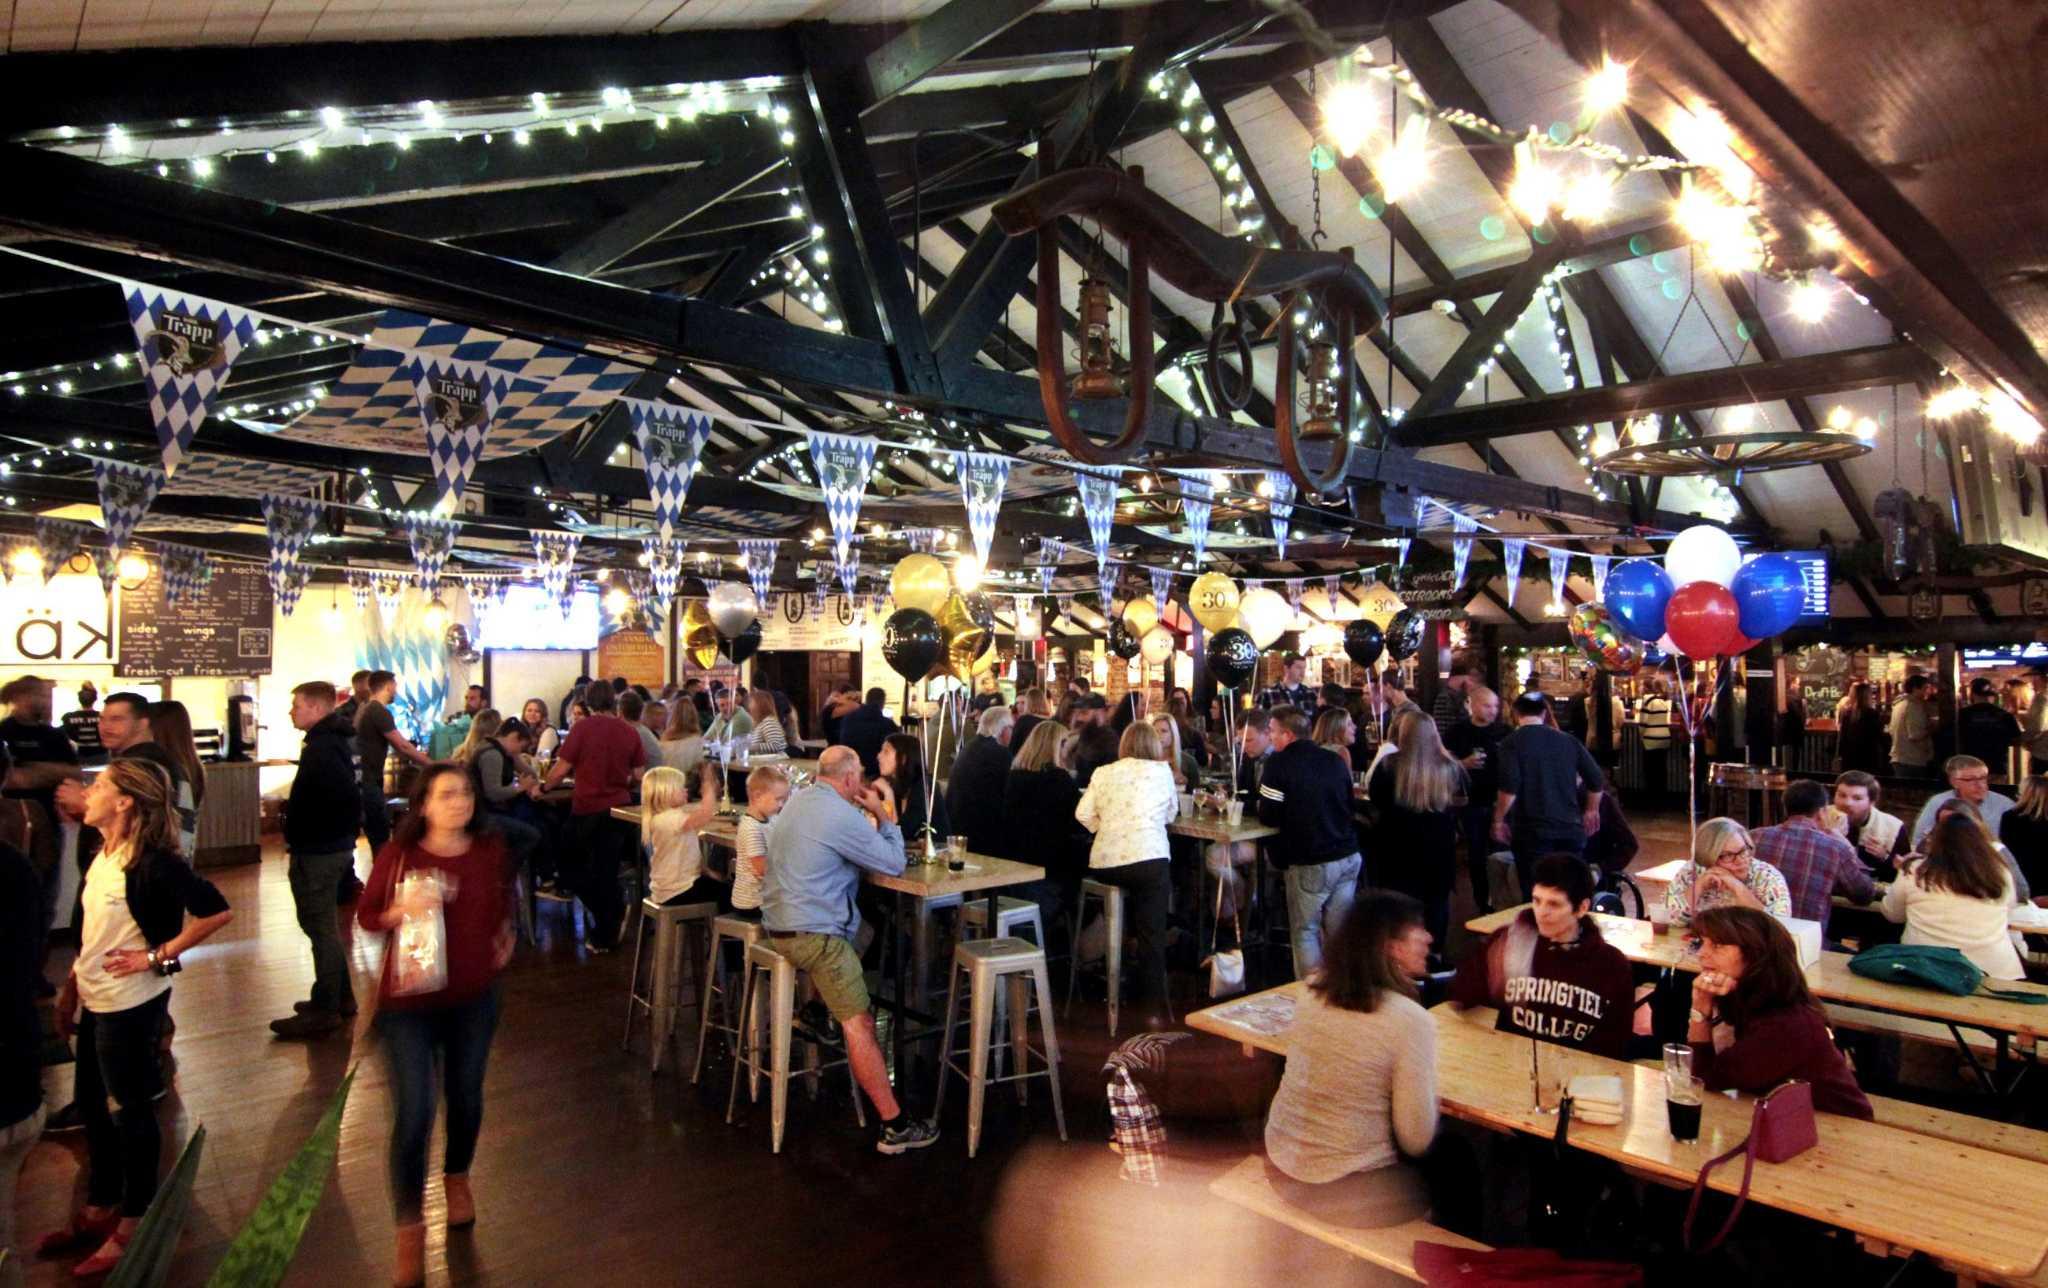 derby beer garden gets go ahead to renovate connecticut post